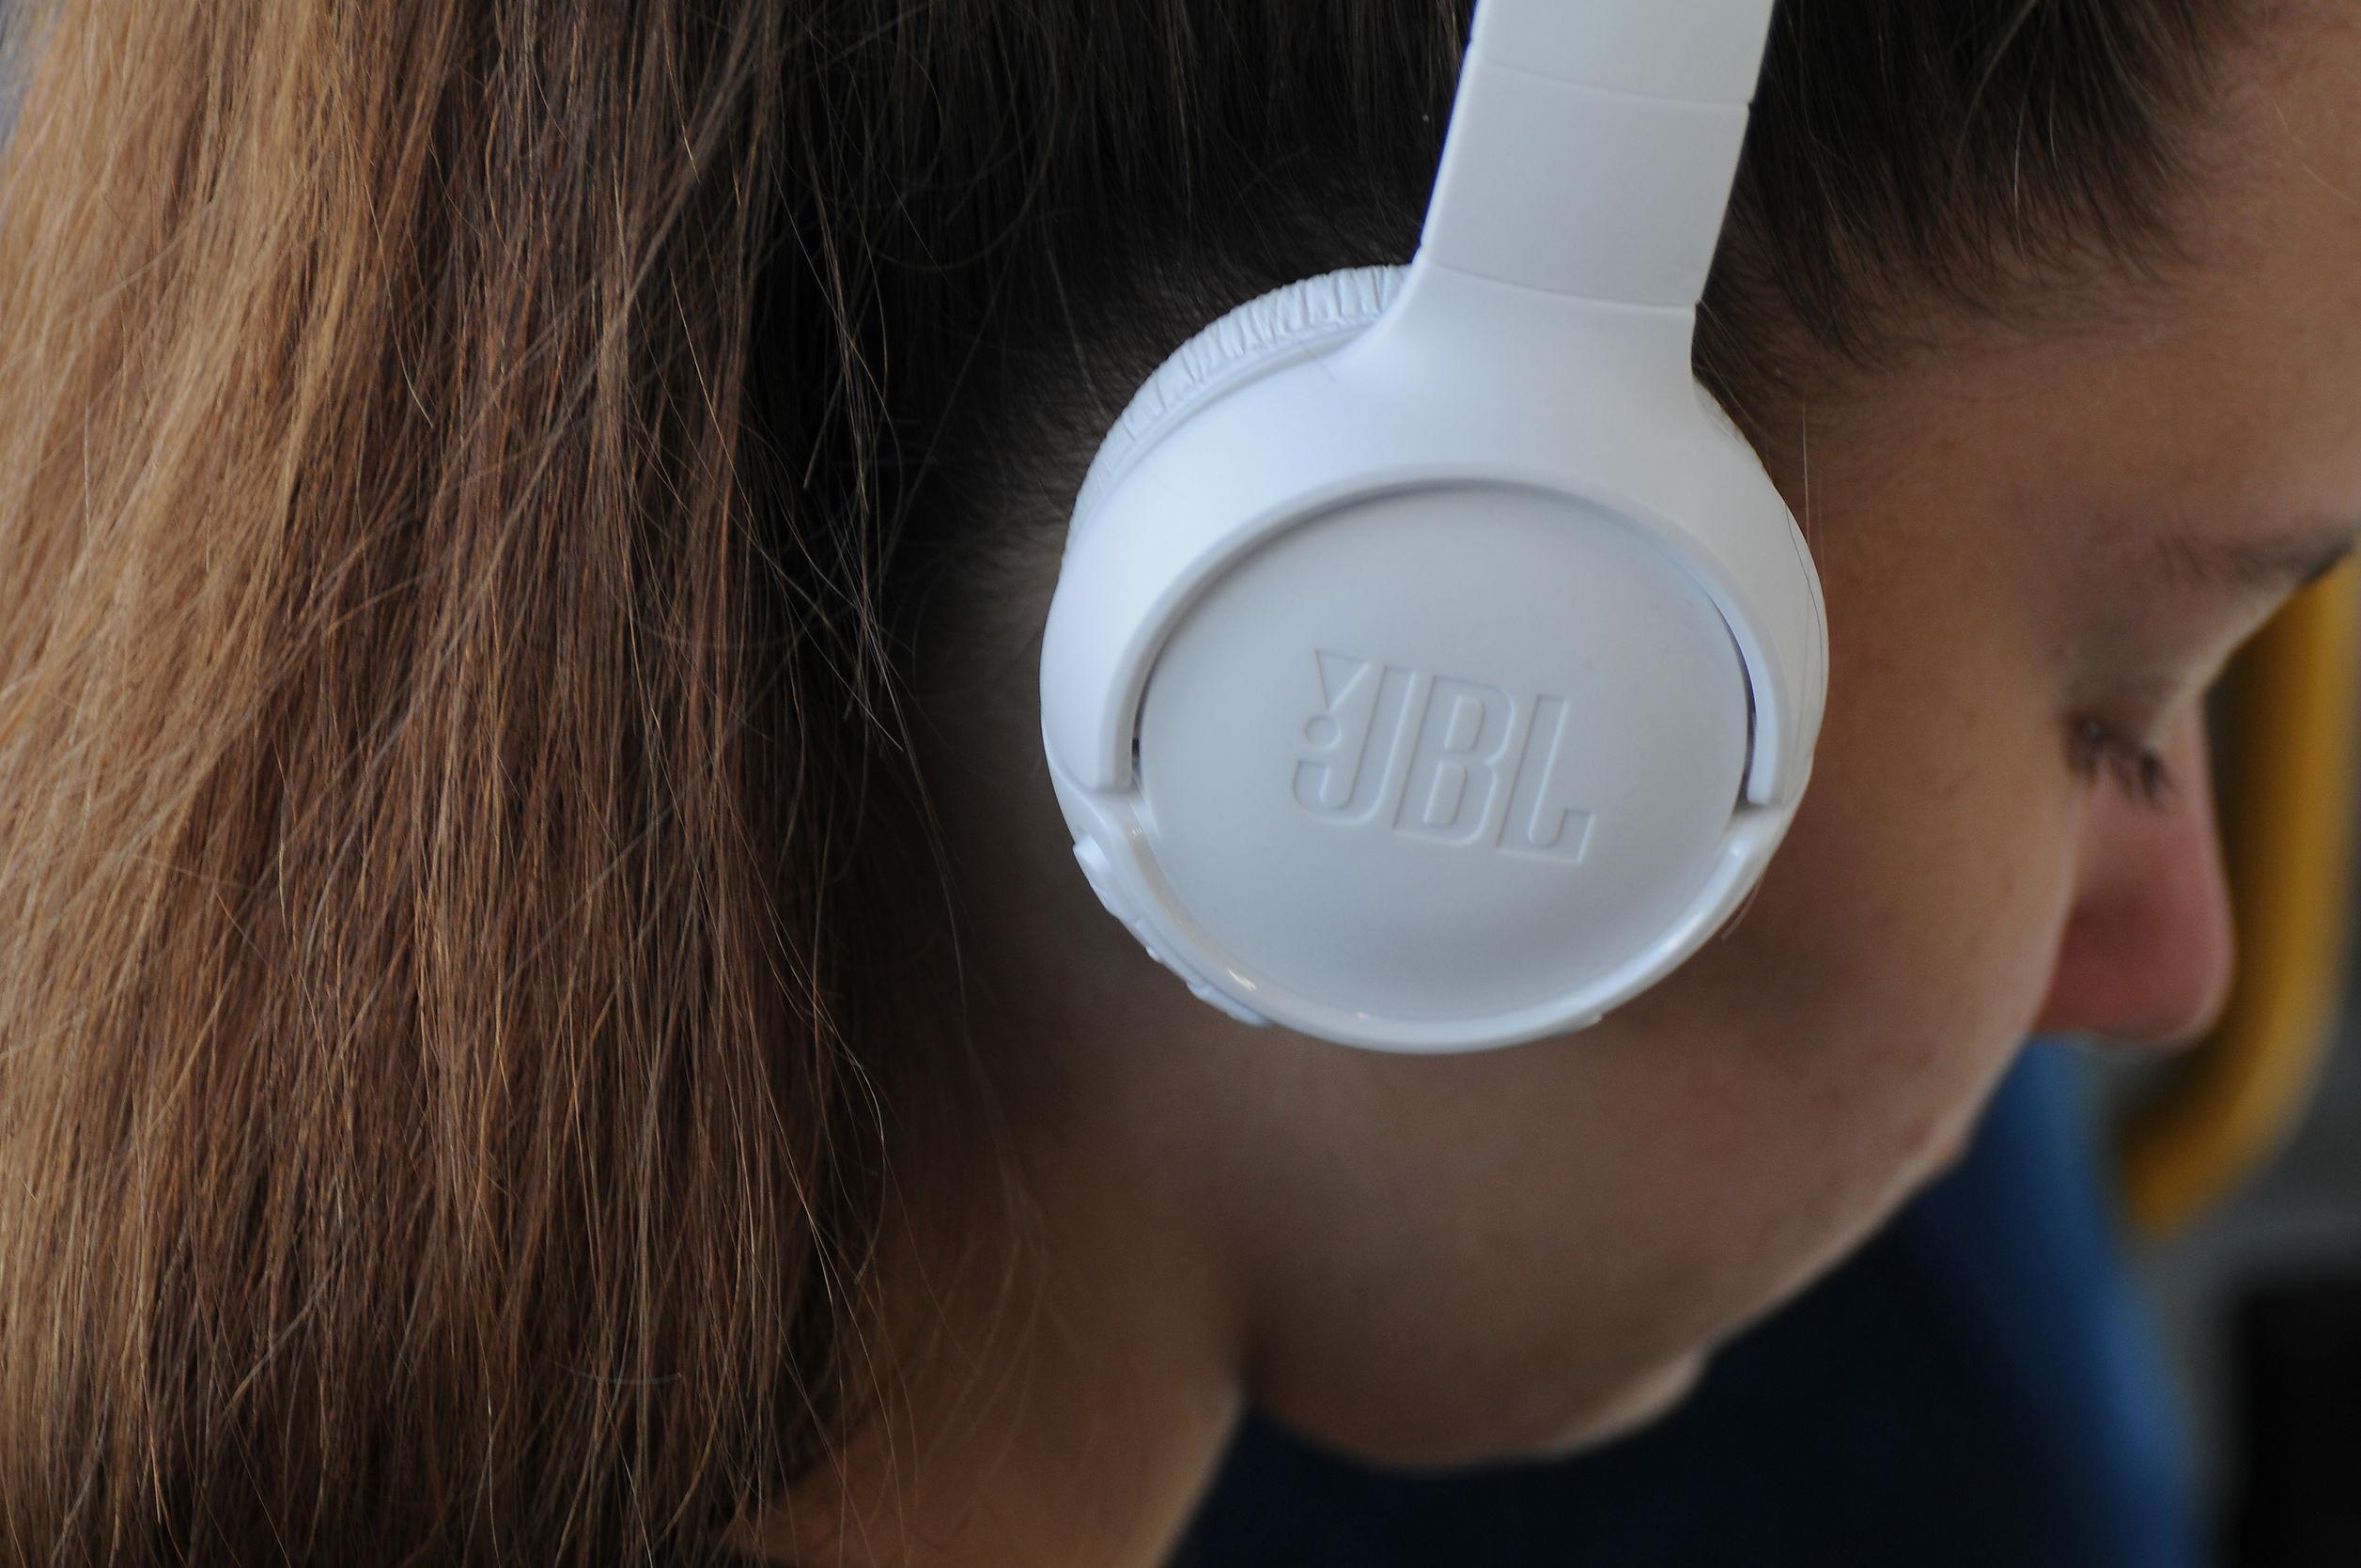 JBL bluetooth Kopfhörer